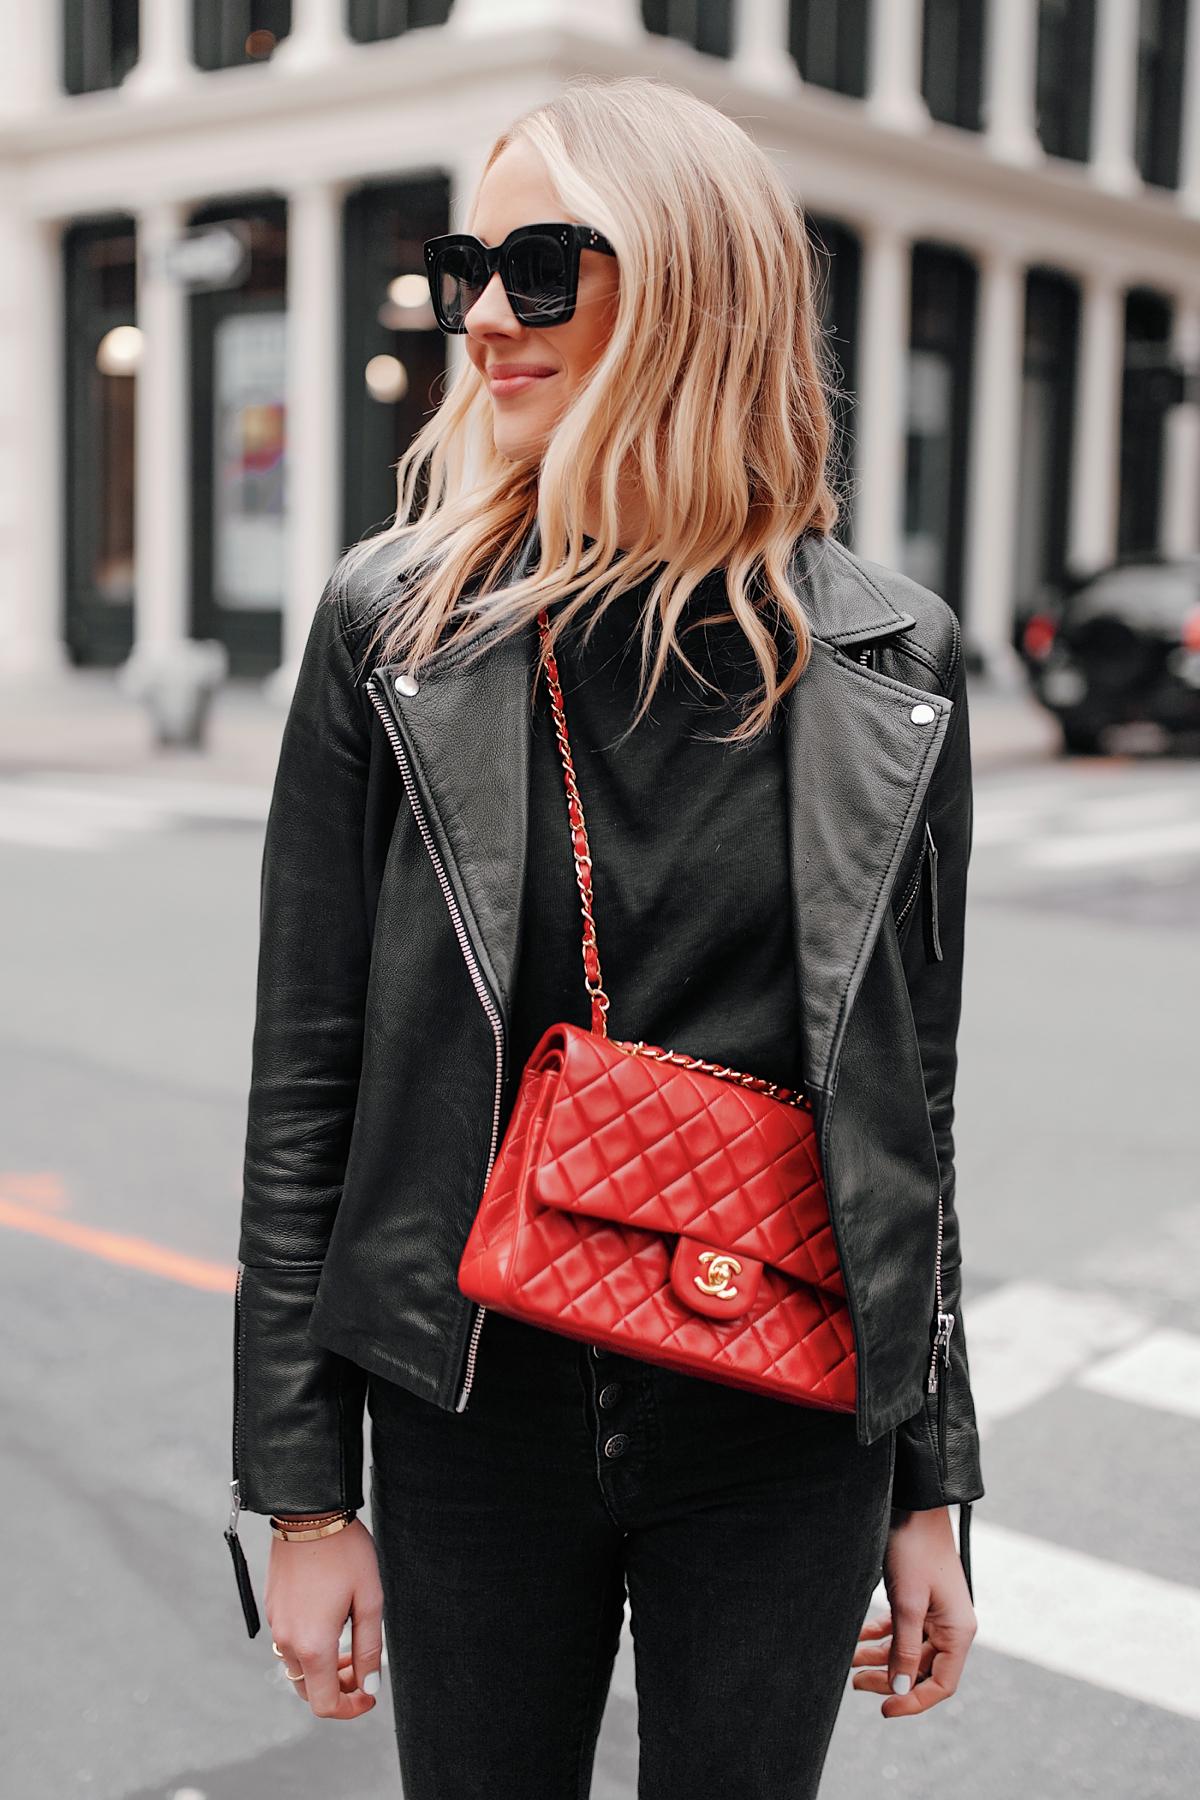 Fashion Jackson Wearing Club Monaco Black Leather Jacket Black Jeans Red Chanel Handbag 1